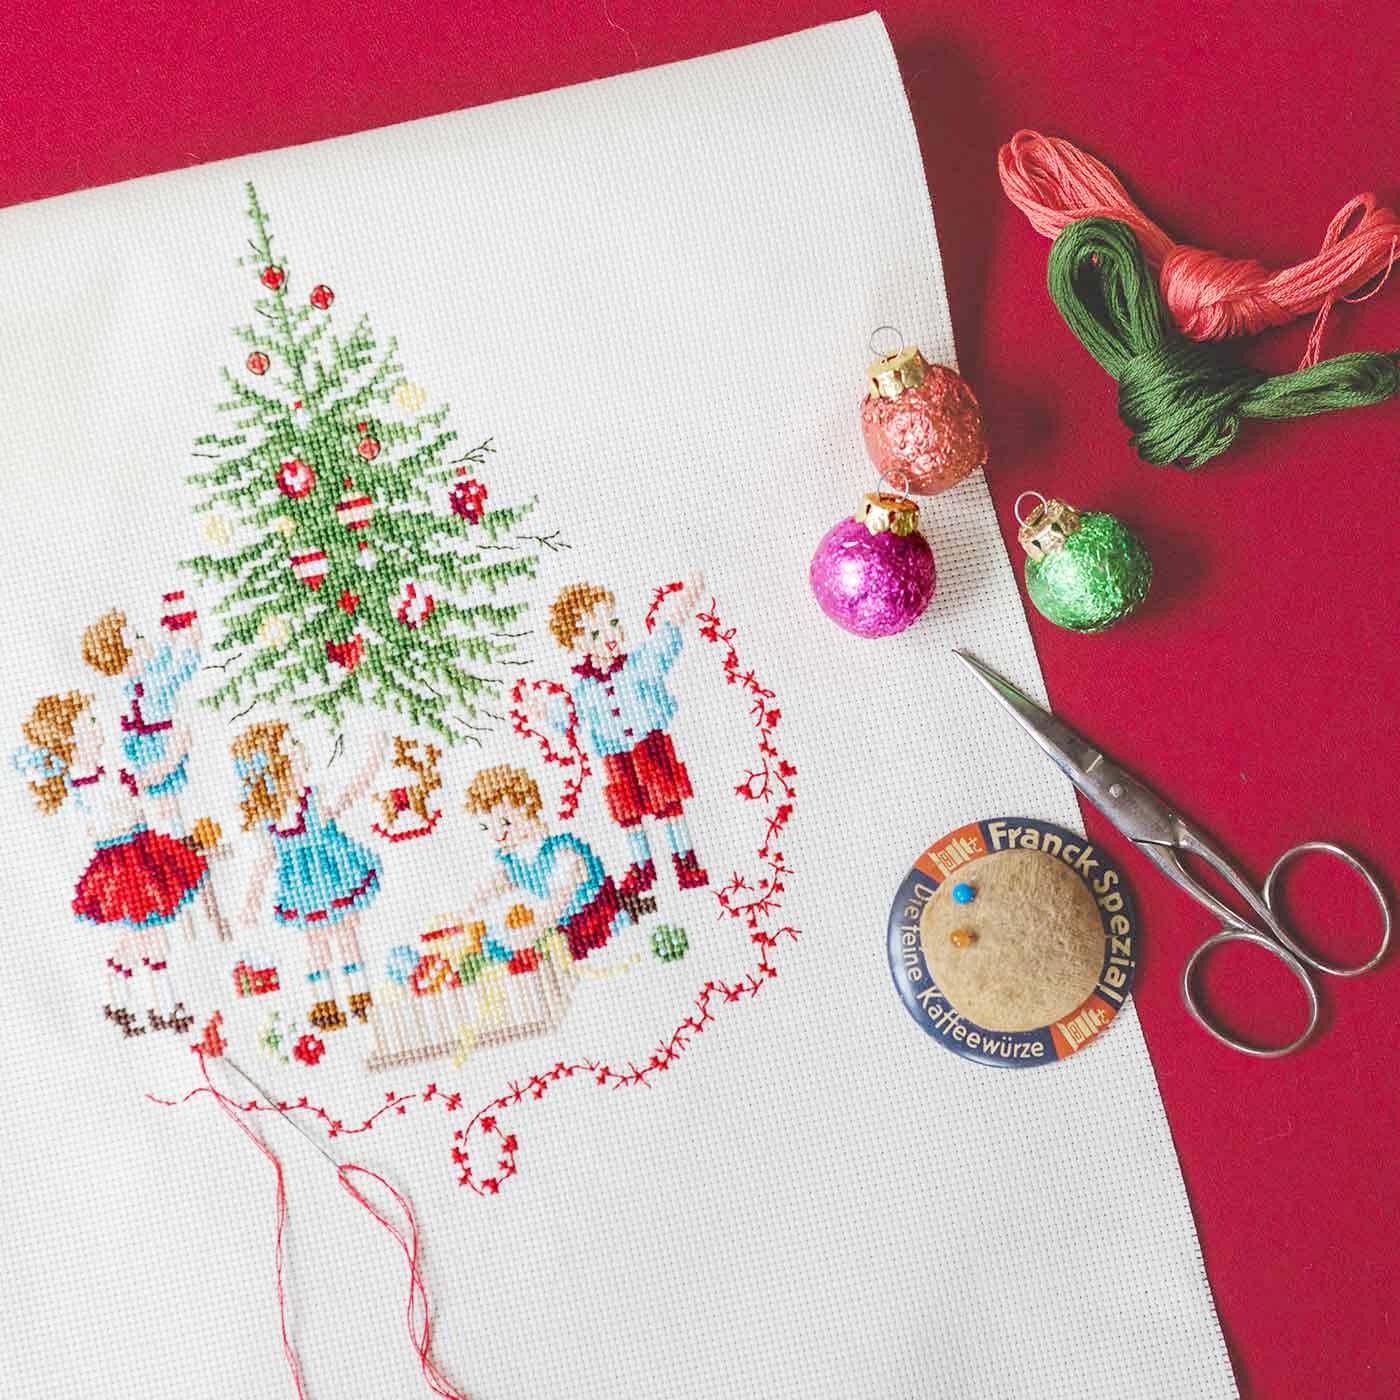 『La magie de NOEL』~クリスマスの魔法~の表紙作品が作れる 材料セット